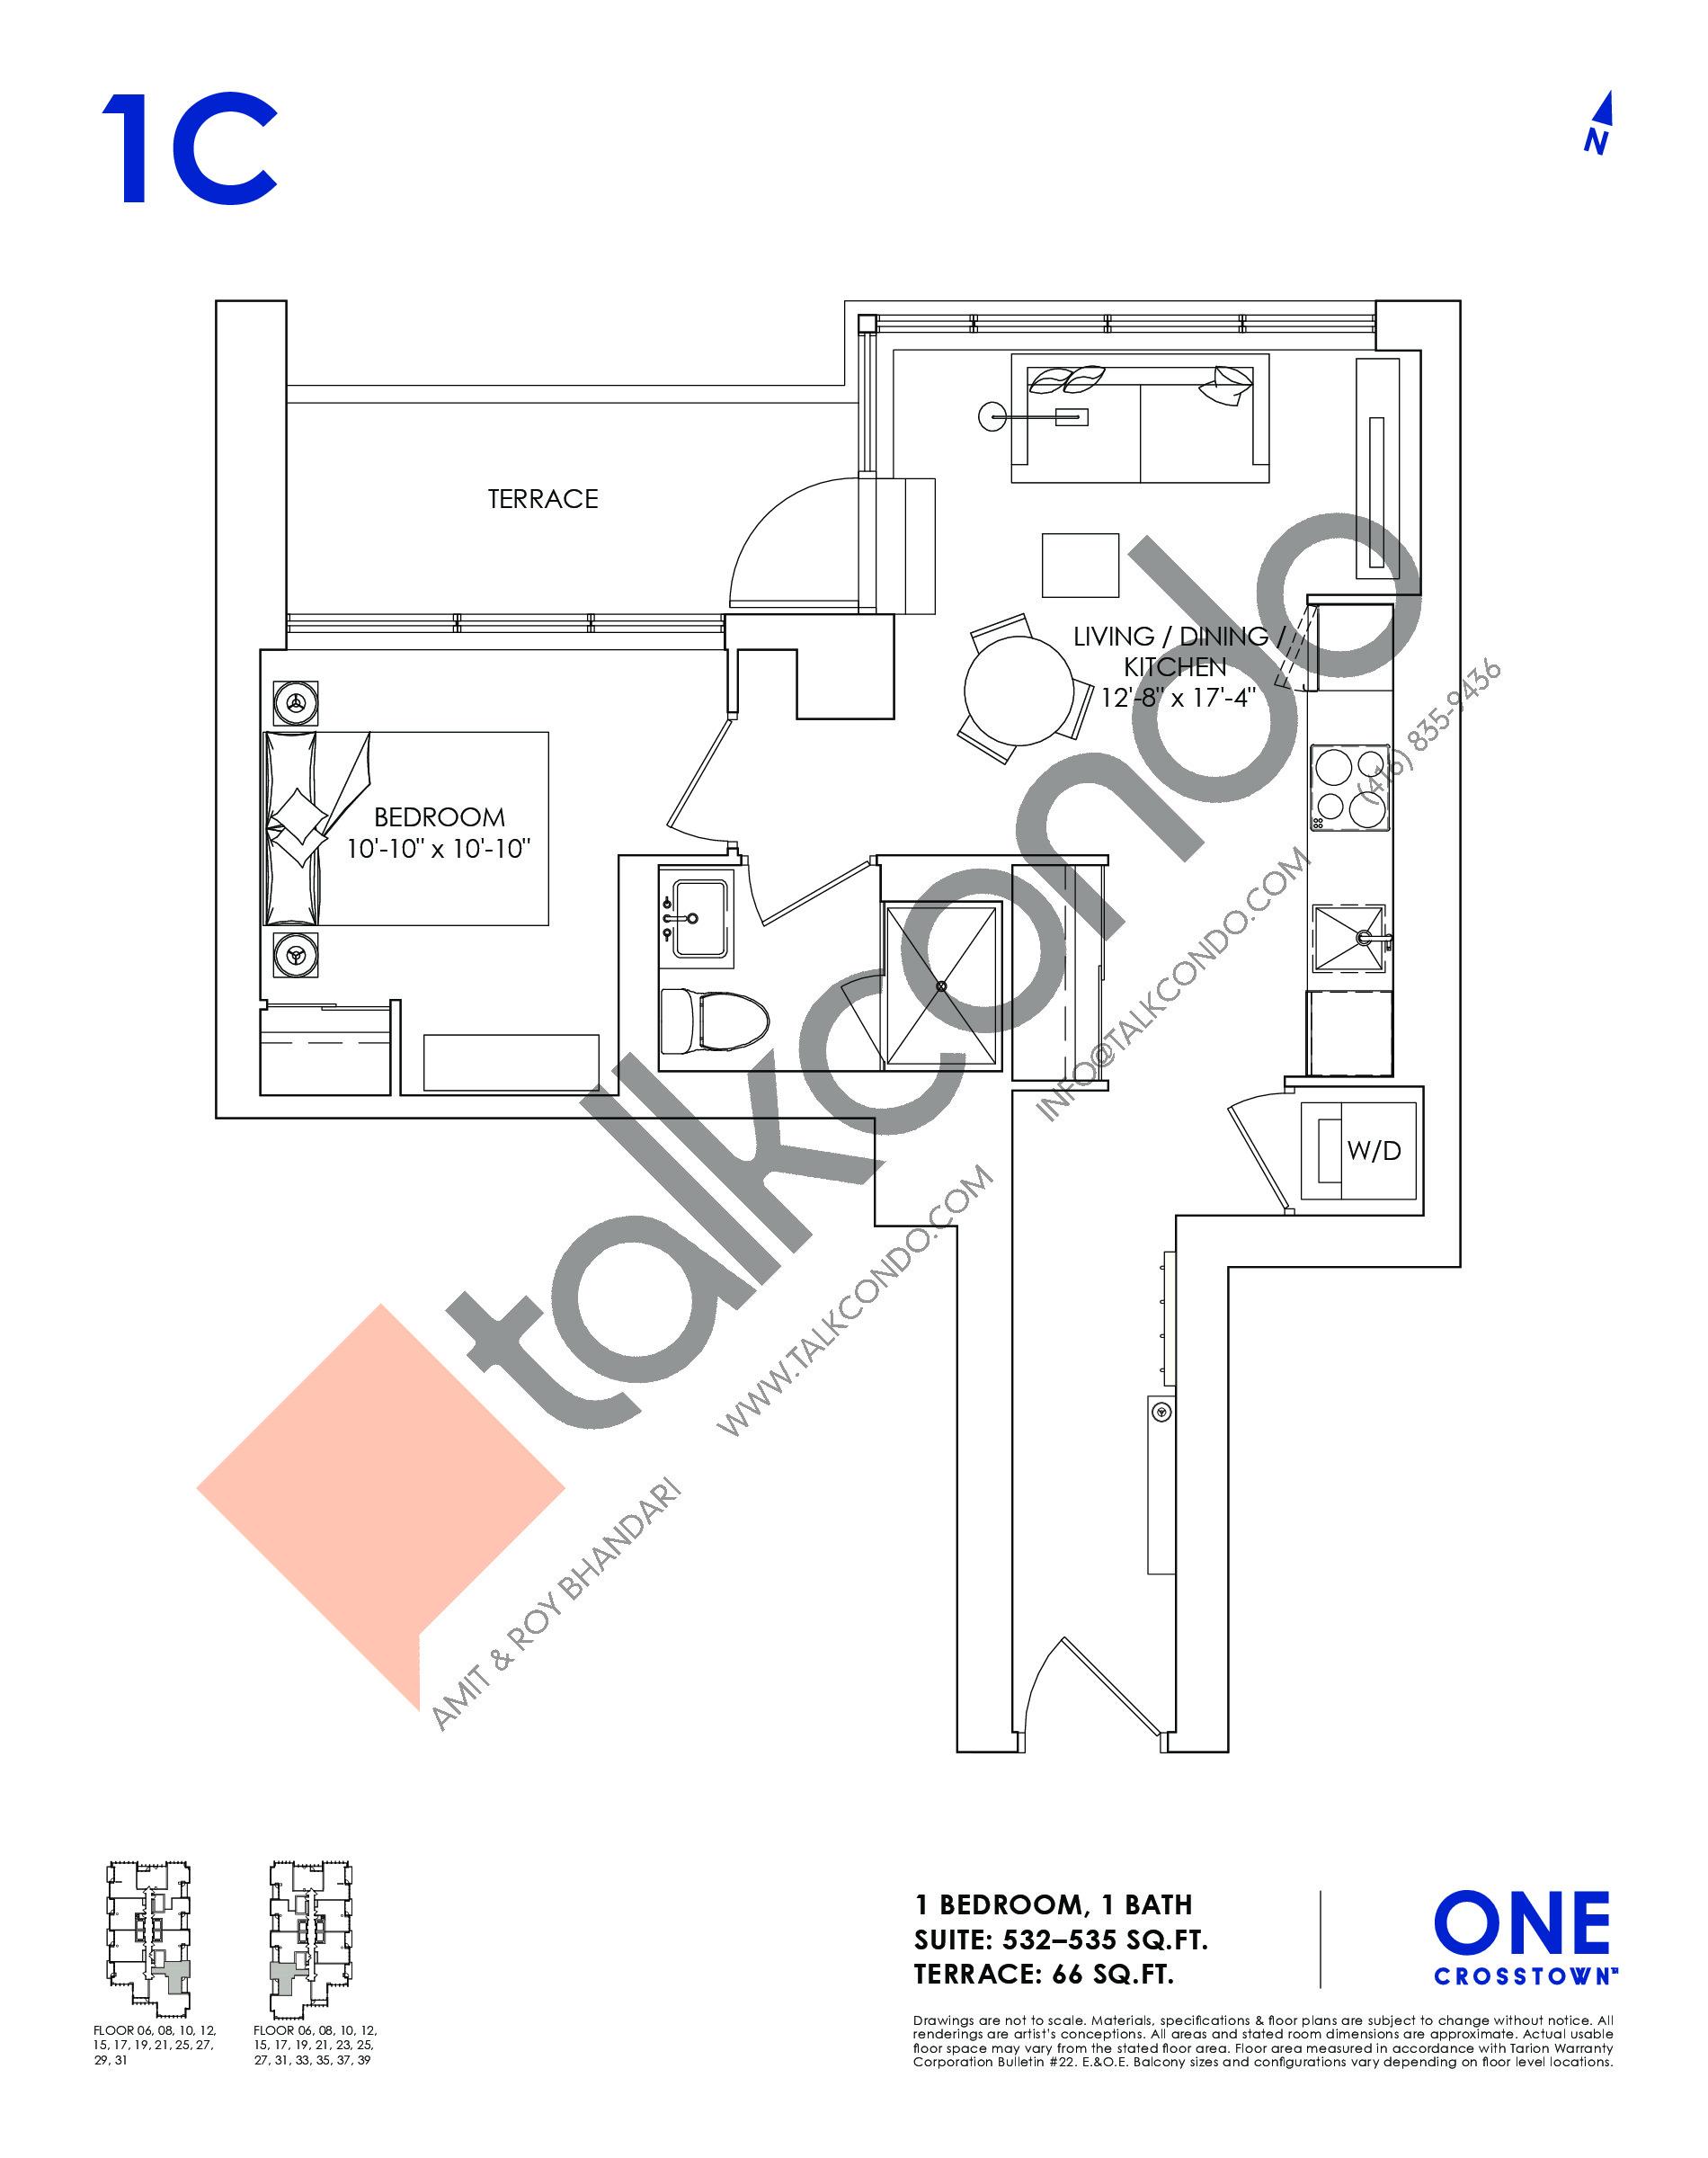 1C Floor Plan at One Crosstown Condos - 535 sq.ft